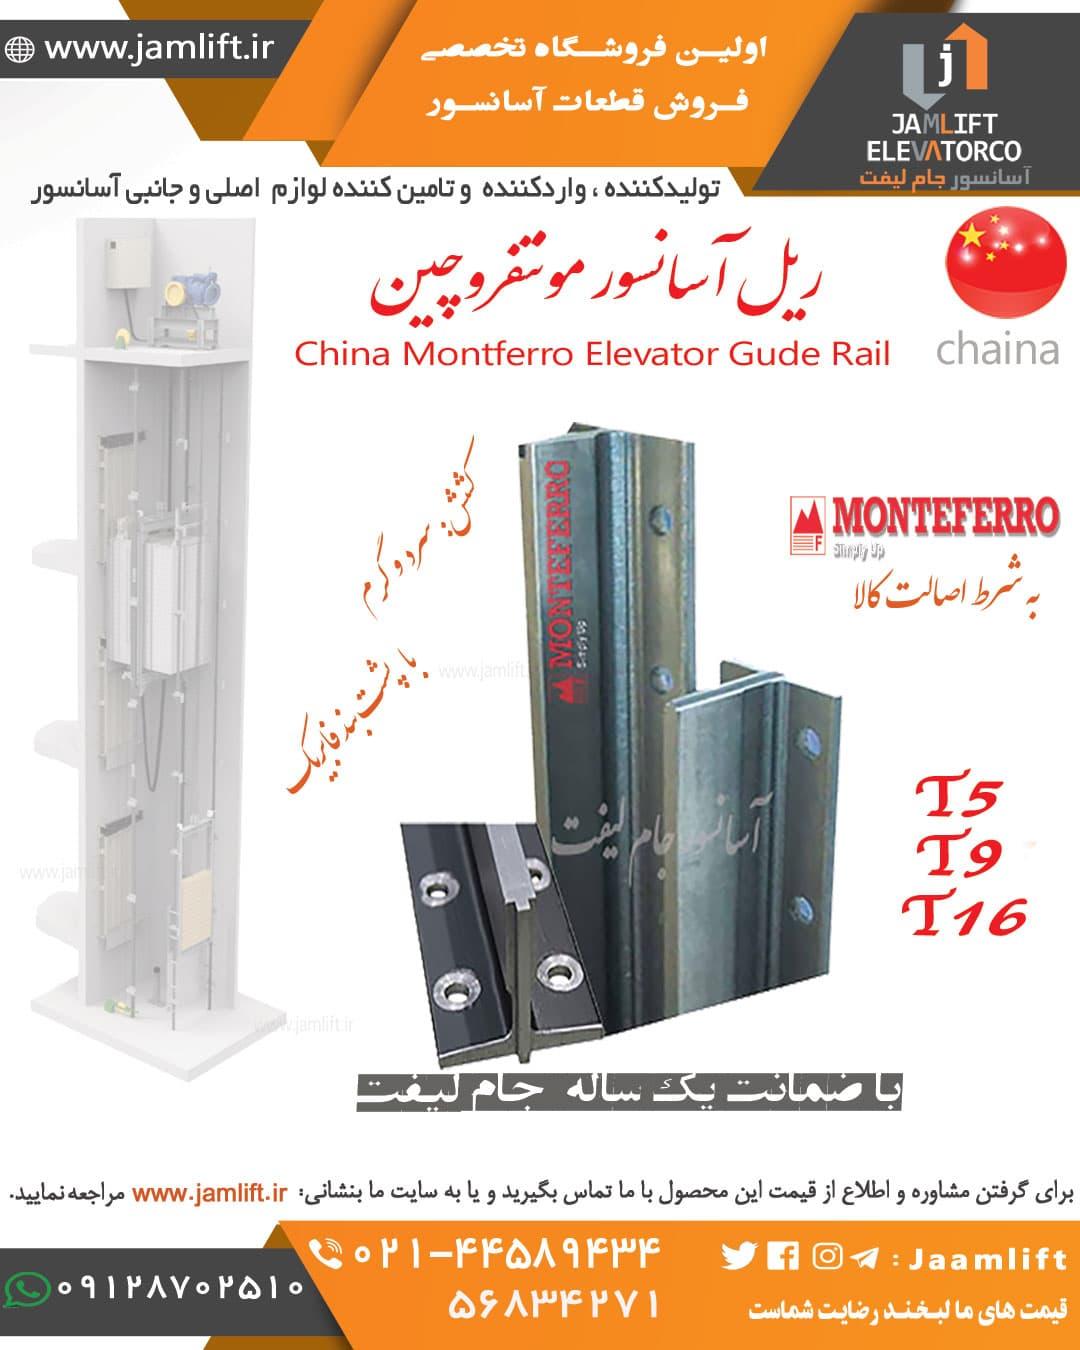 قیمت ریل چین سرد مونتفرو